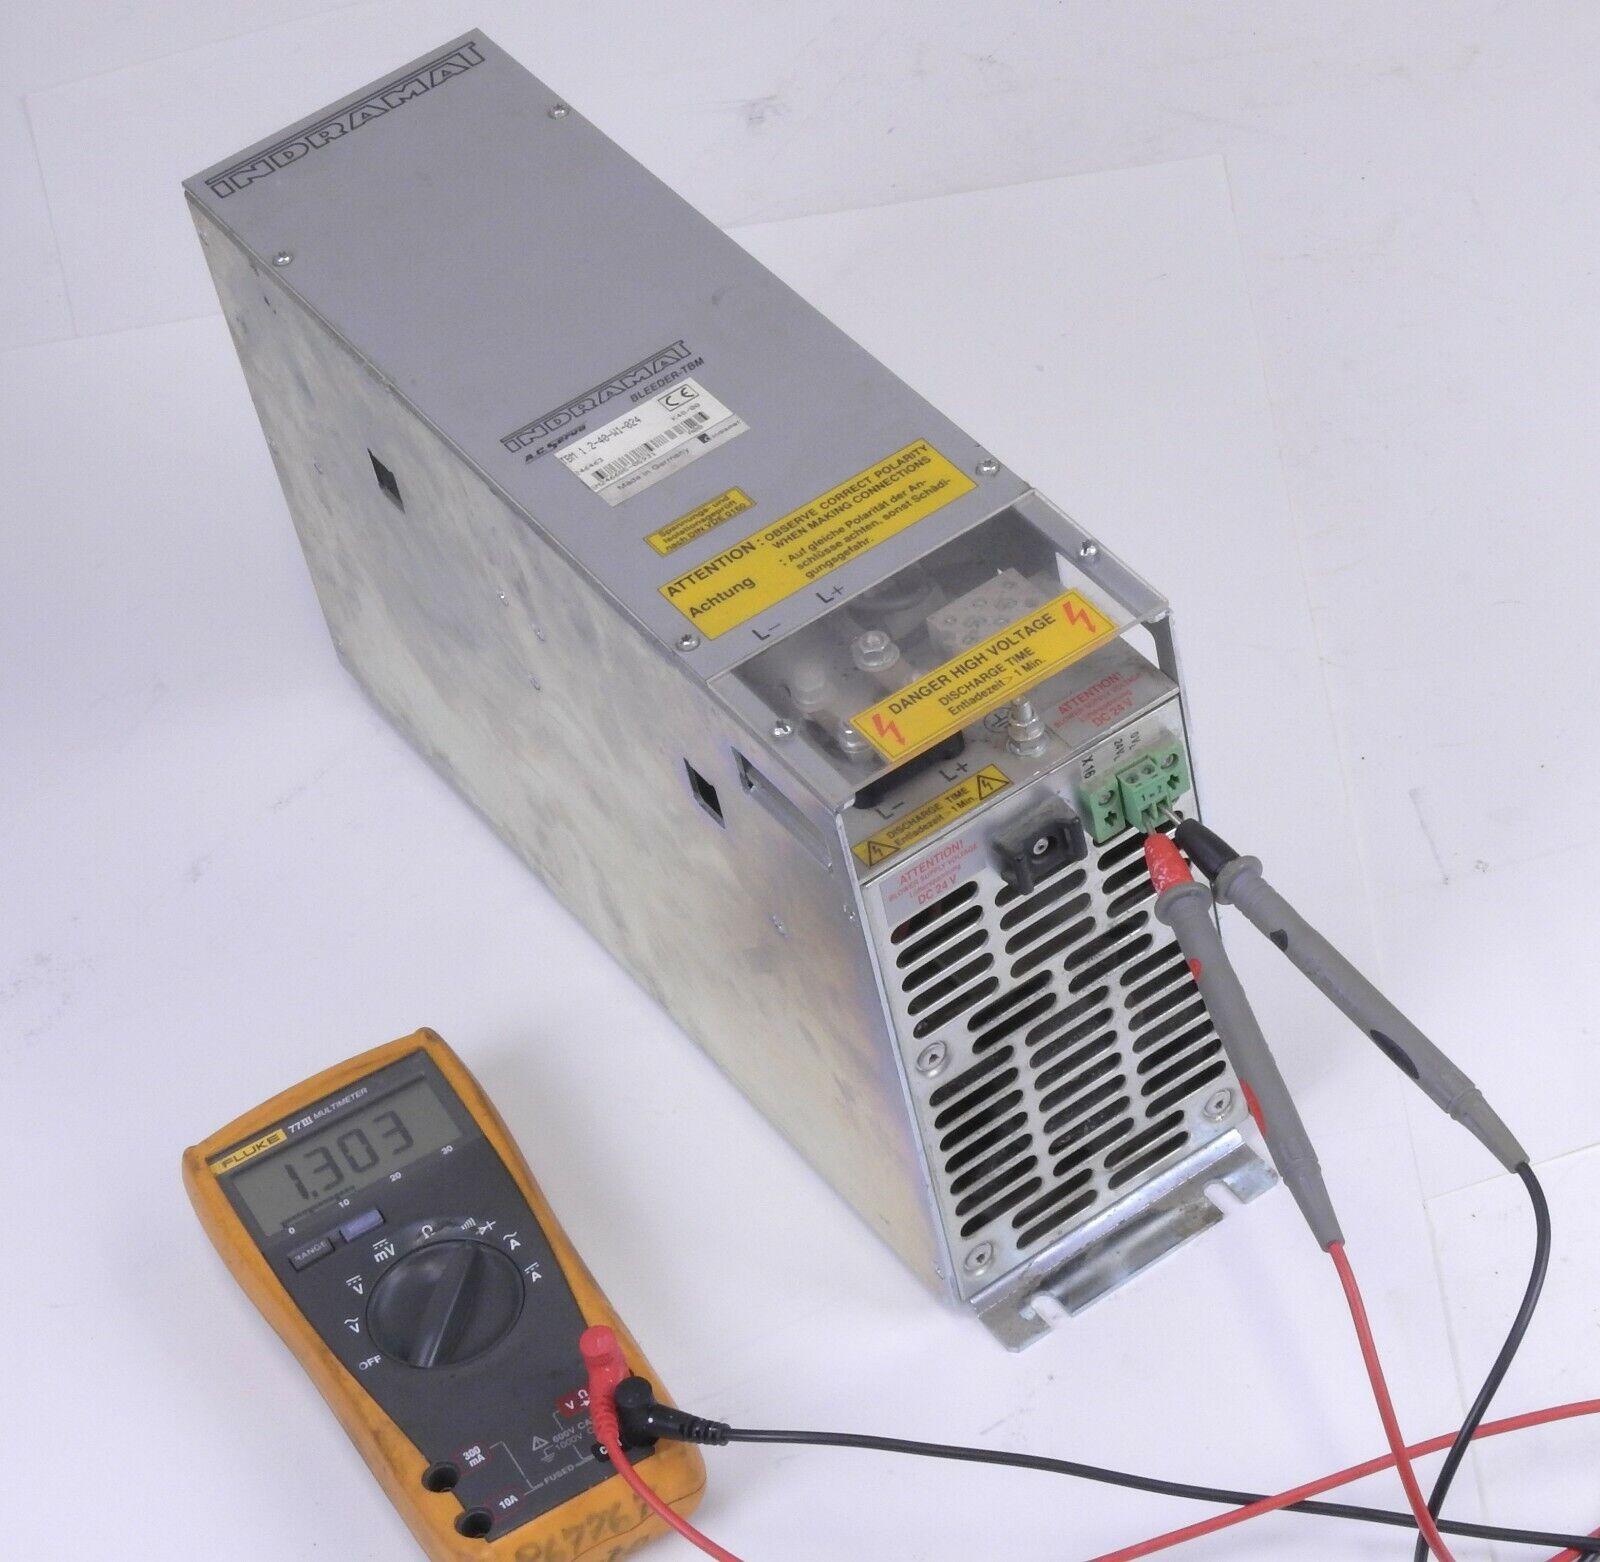 INDRAMAT TBM 1.2-40-W1-024 AC SERVO BLEEDER